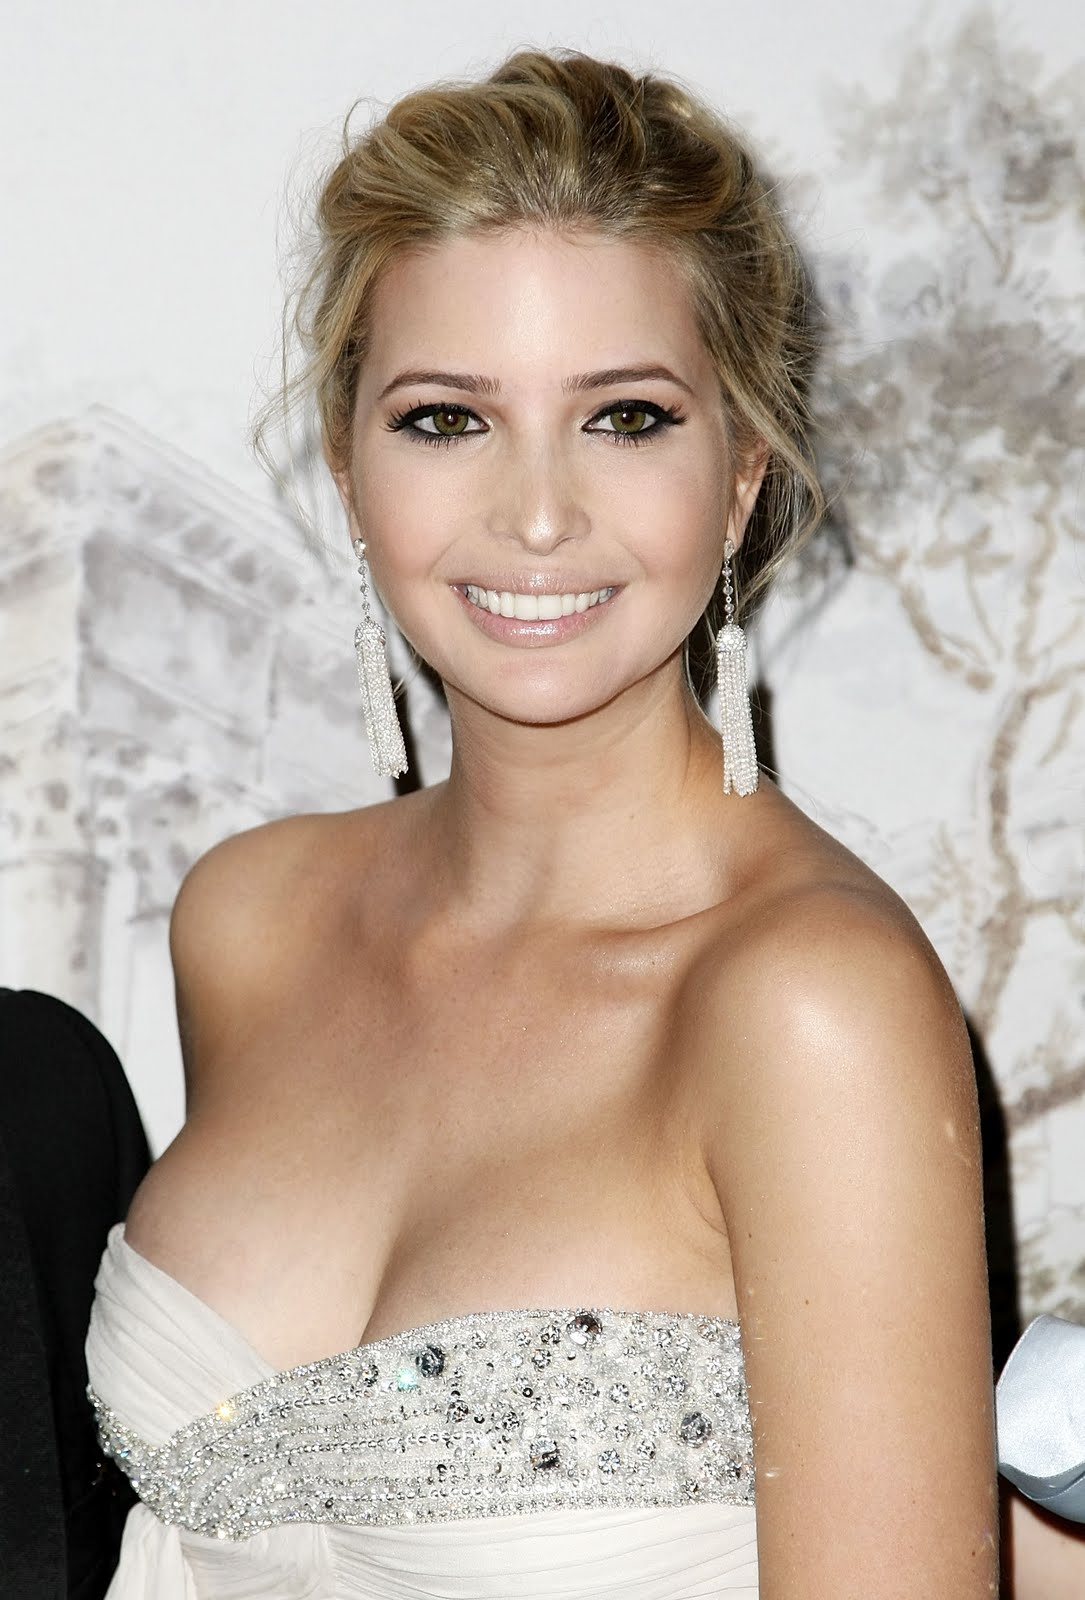 Ivanka Trump Actress And ModelIvanka Trump